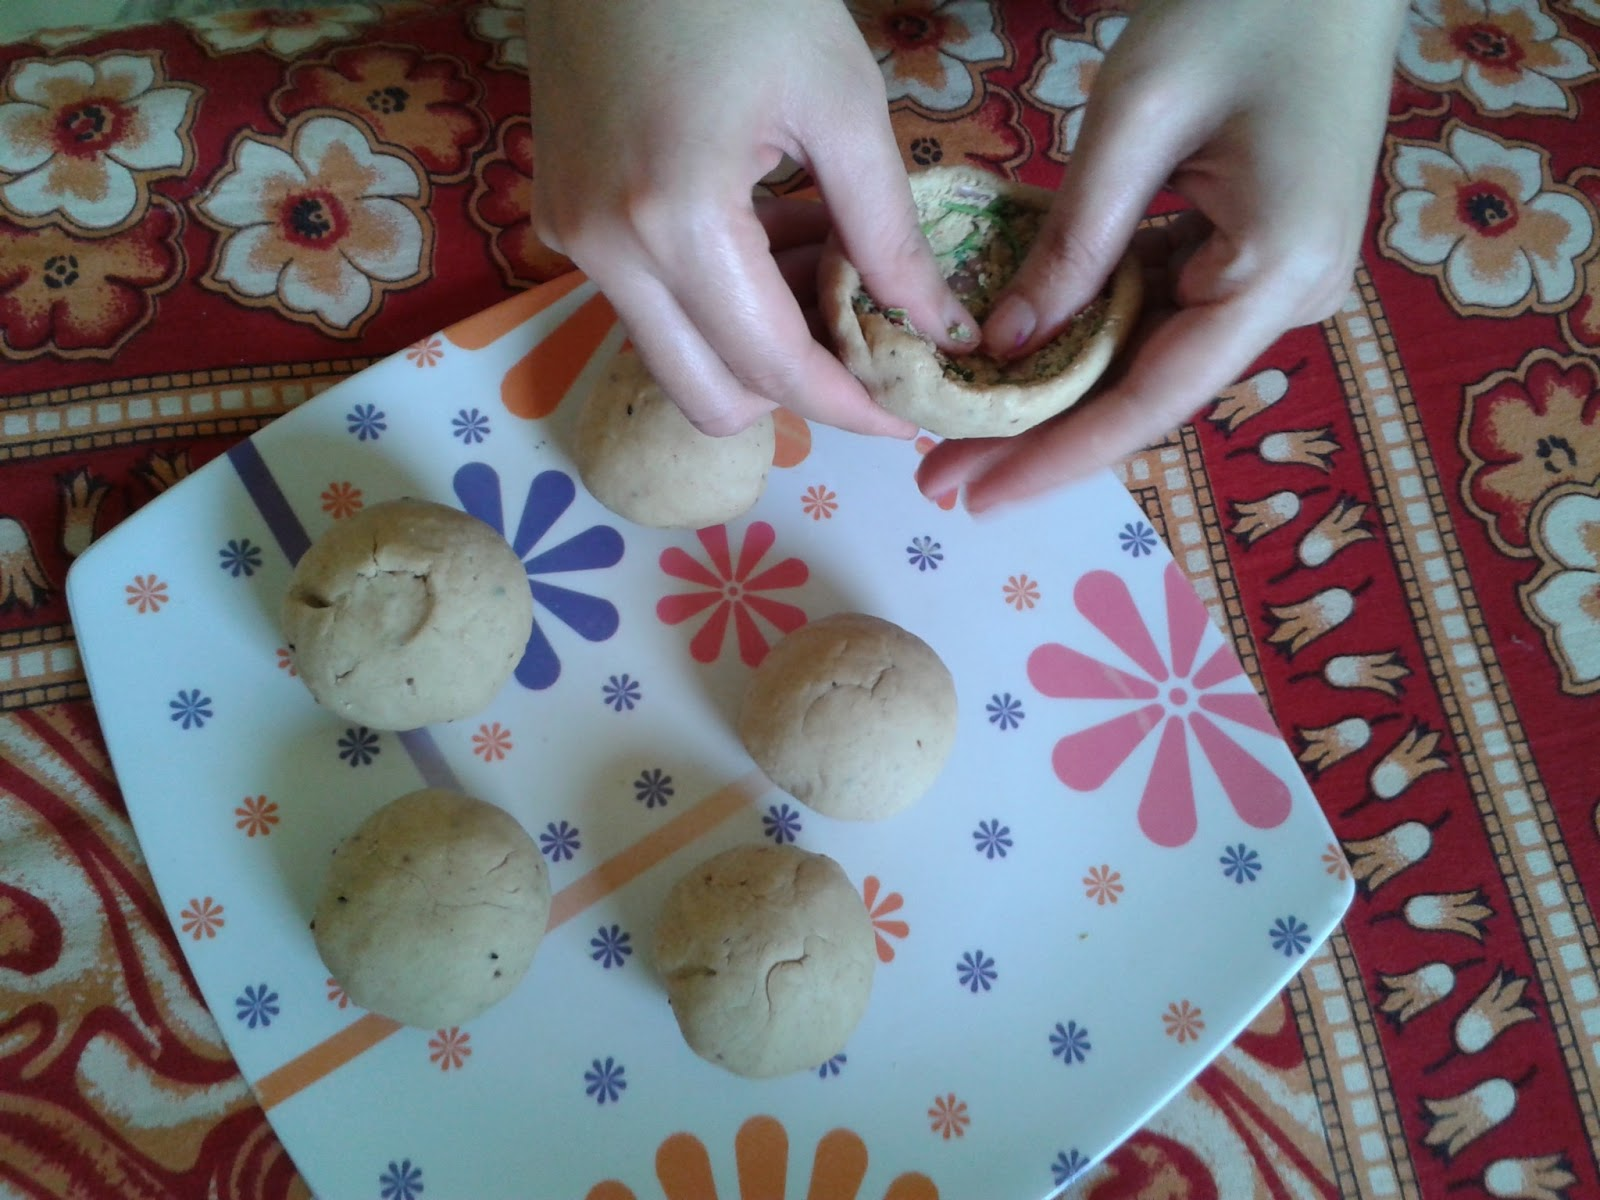 सत्तू की कचोरी - Sattu ki Kachori Recipe